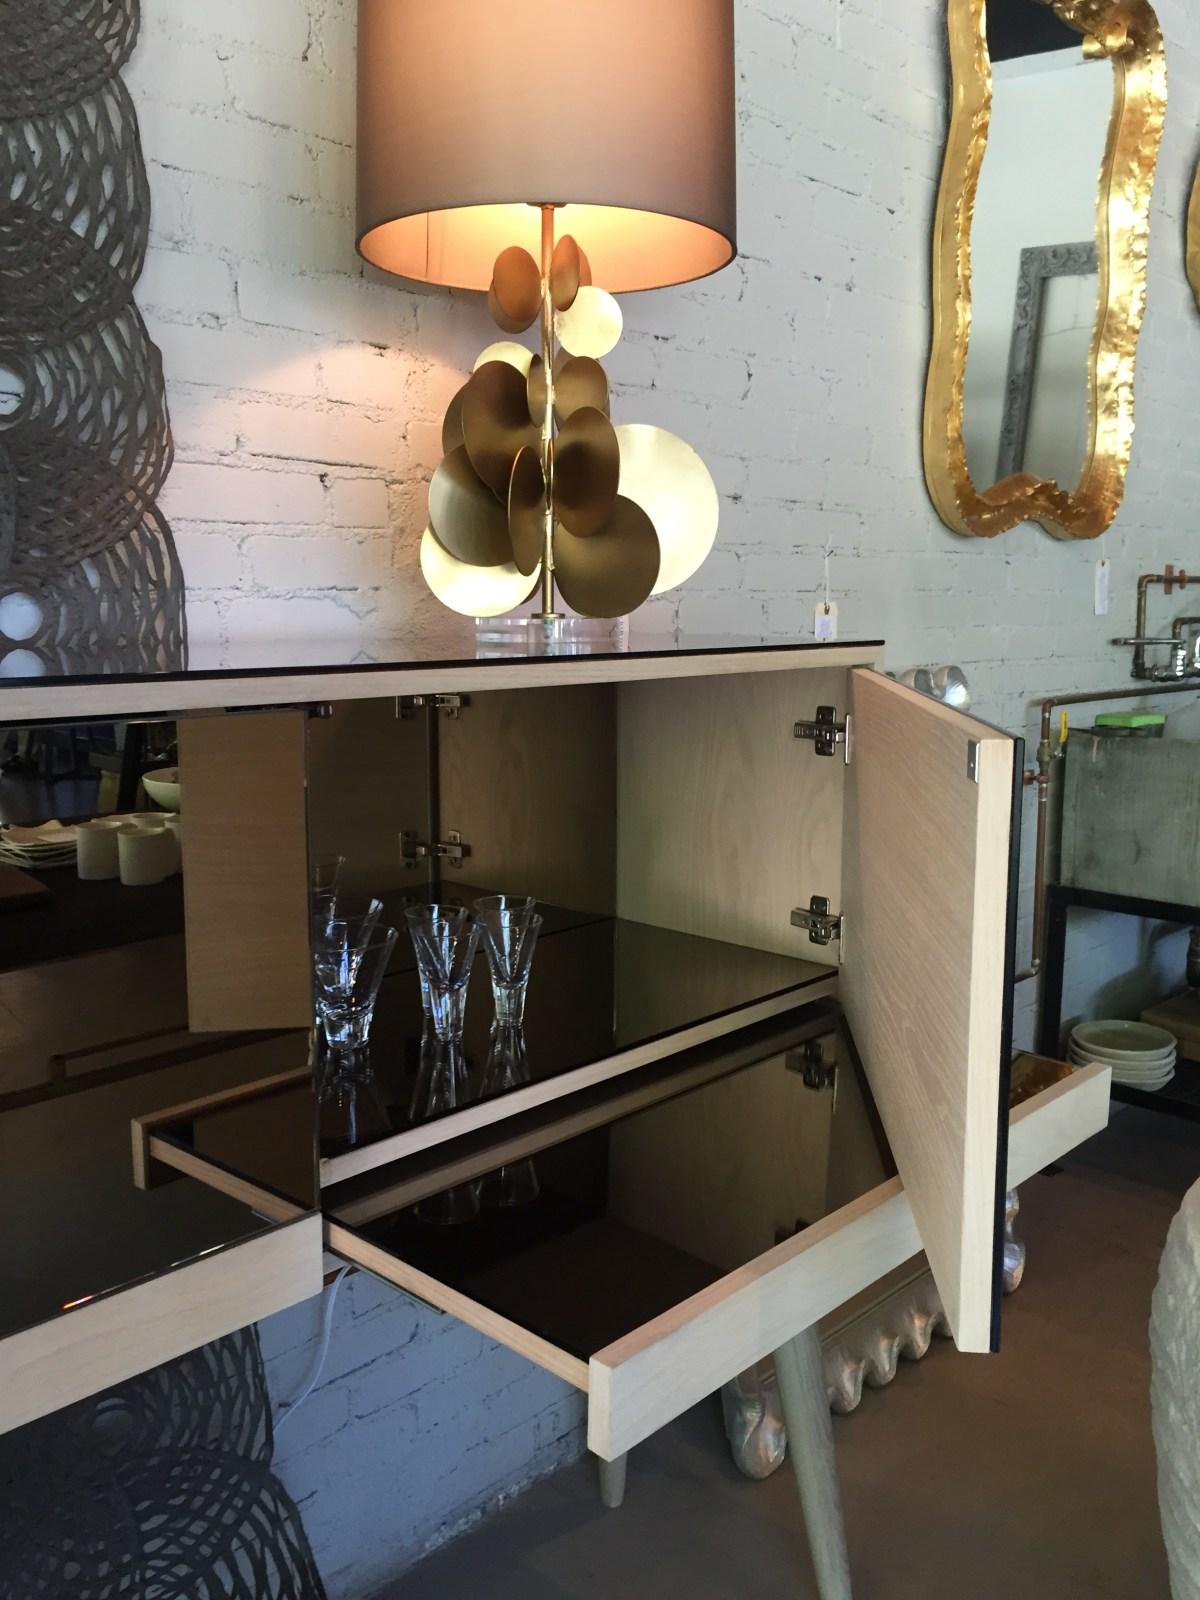 bronze-bar-mirror-drawers